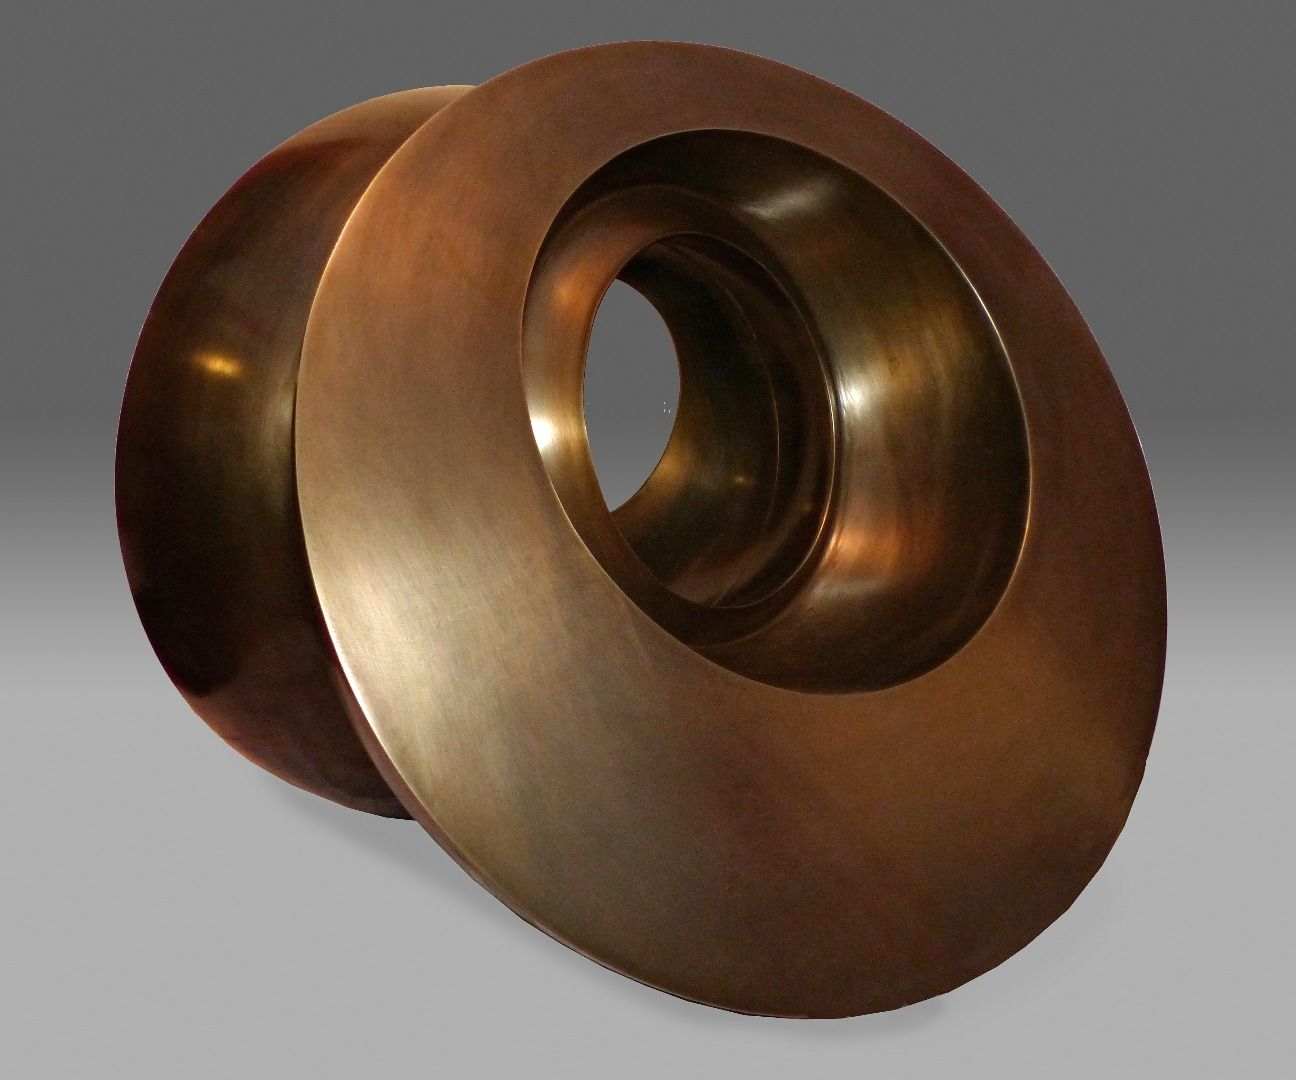 Spun Steel and Waterjet Cut Sculpture #2